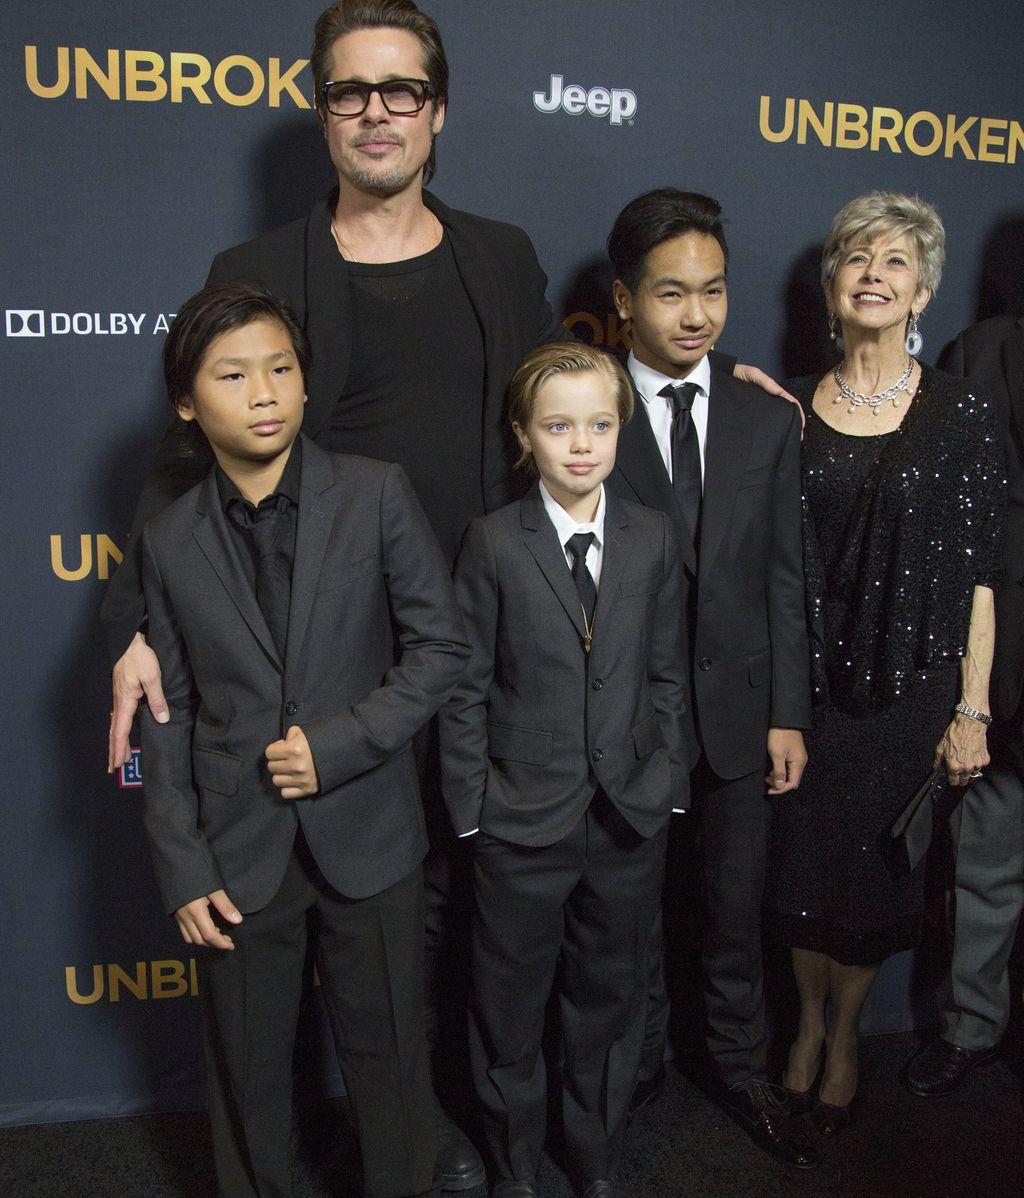 Brad Pitt,Angelina Jolie,Shiloh,john,transexual,travesti